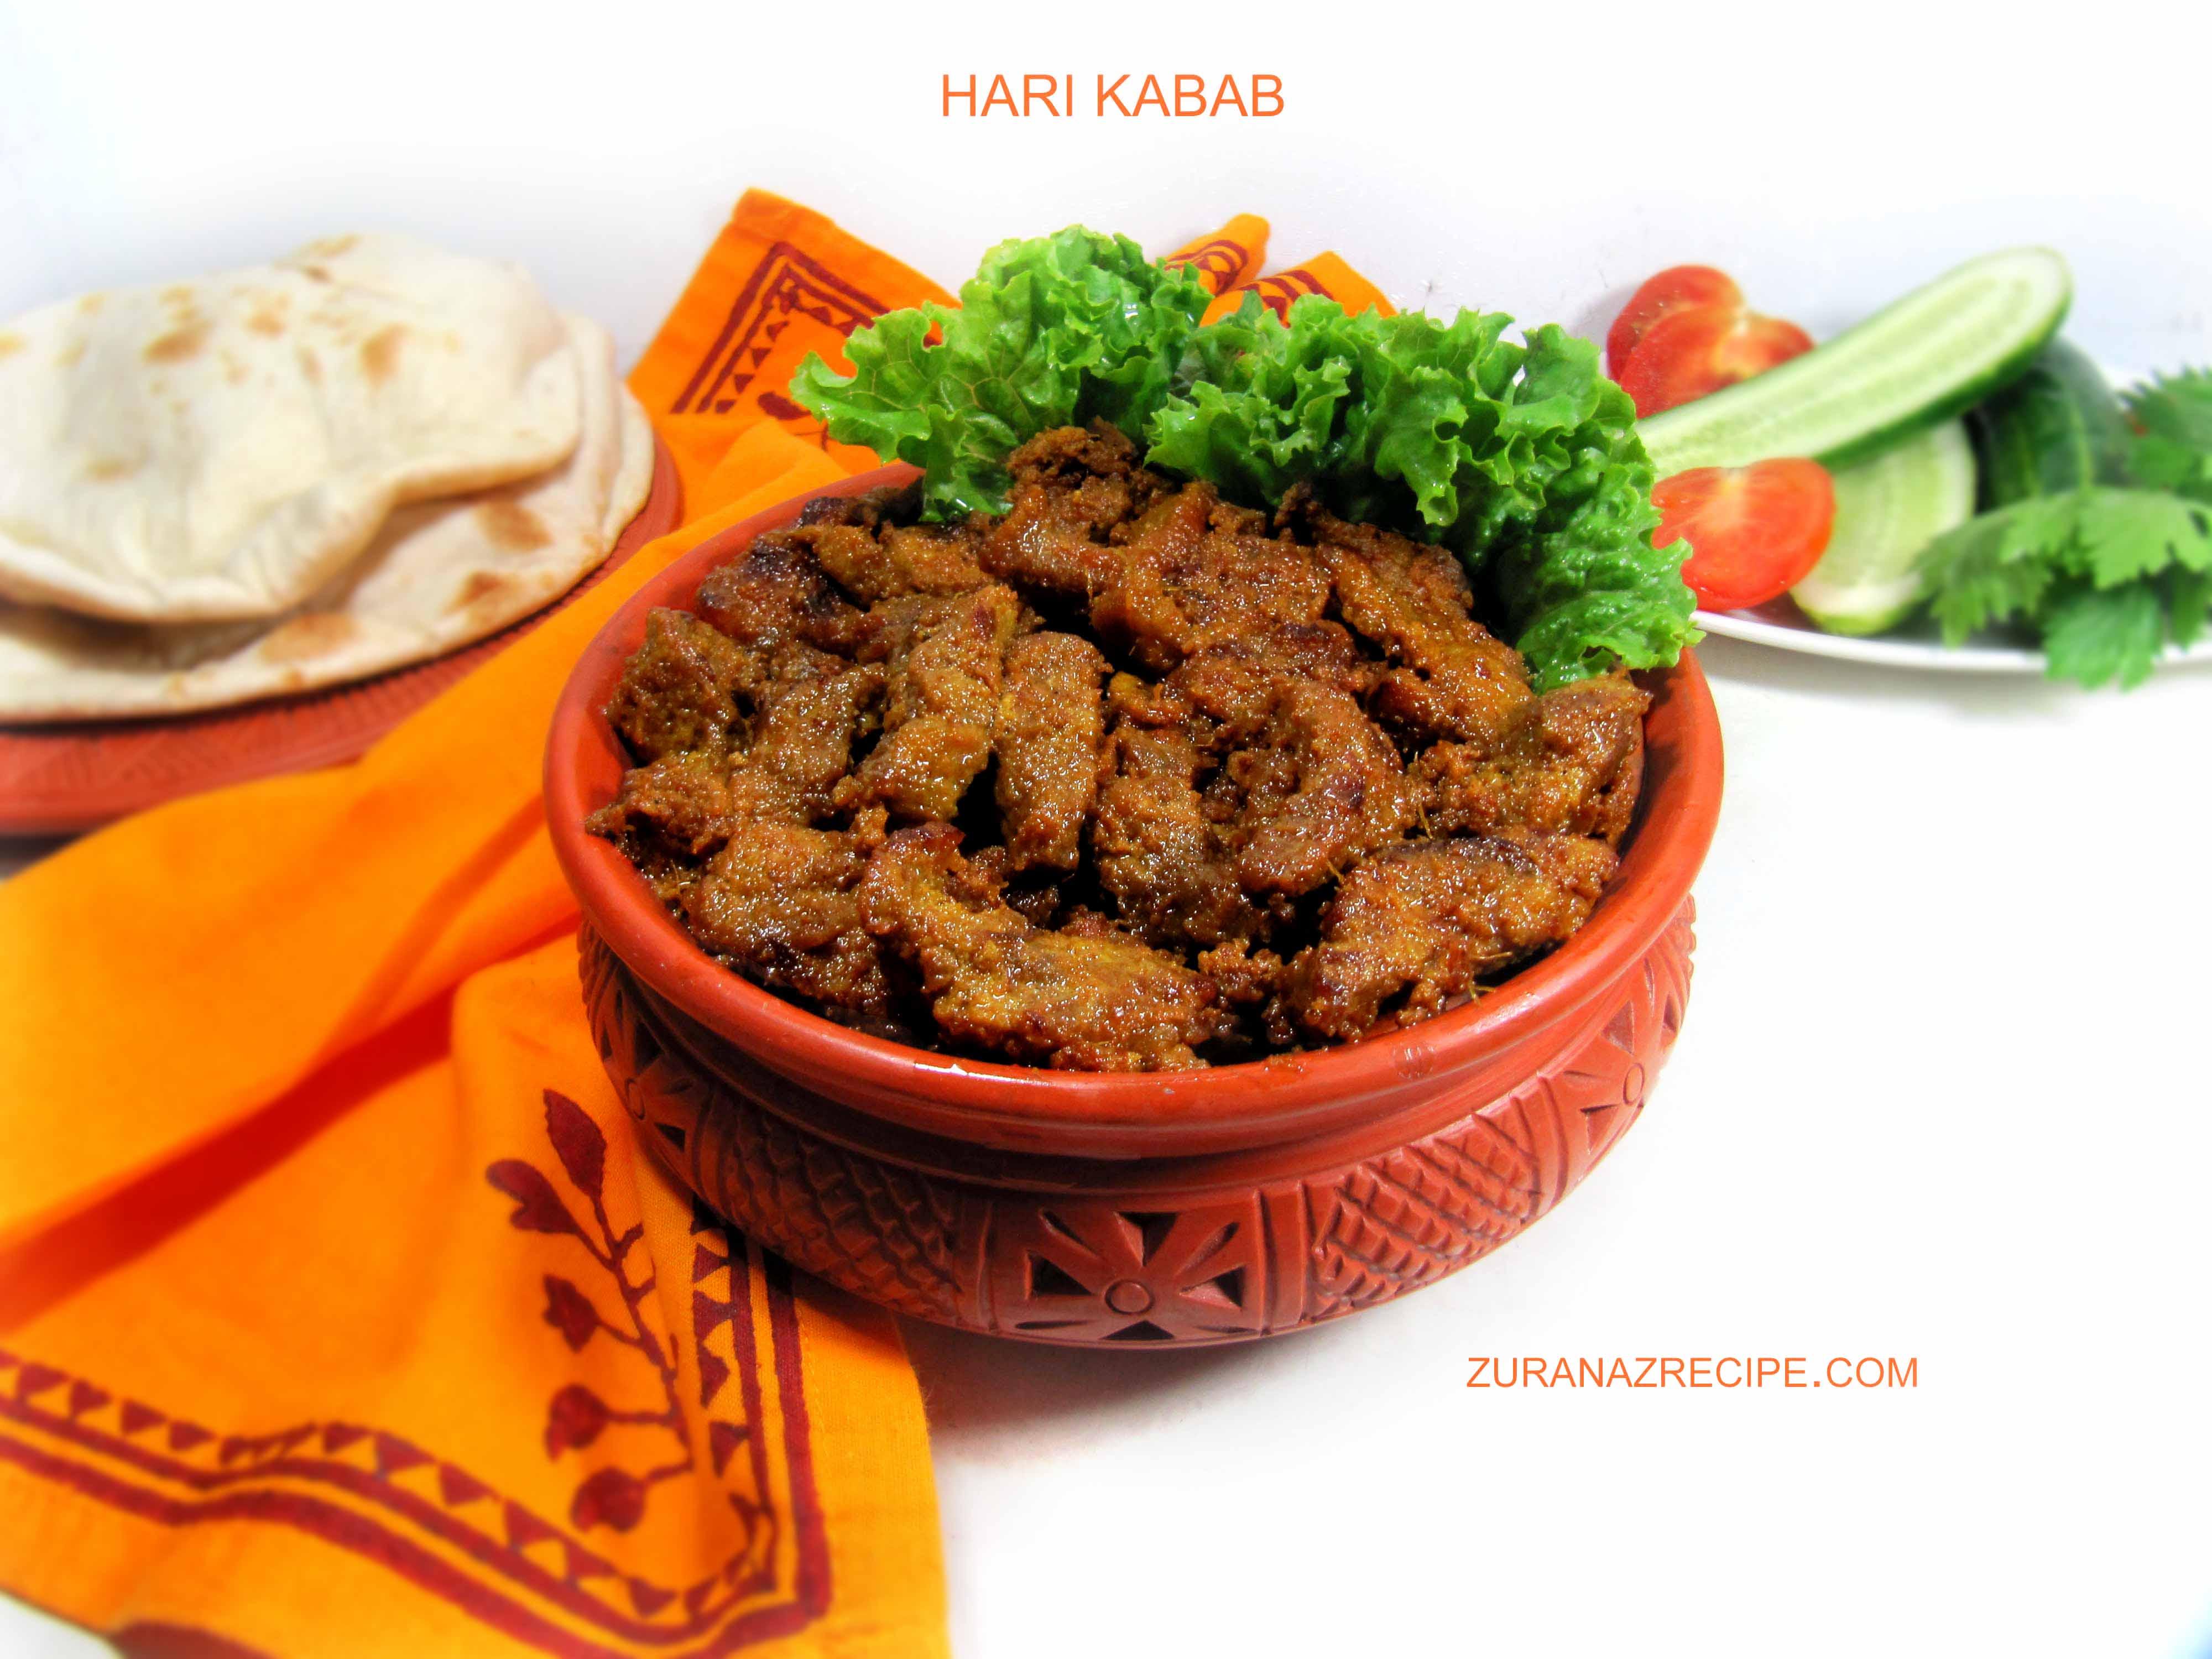 hari kabab recipe – bangladeshi hari kabab recipe